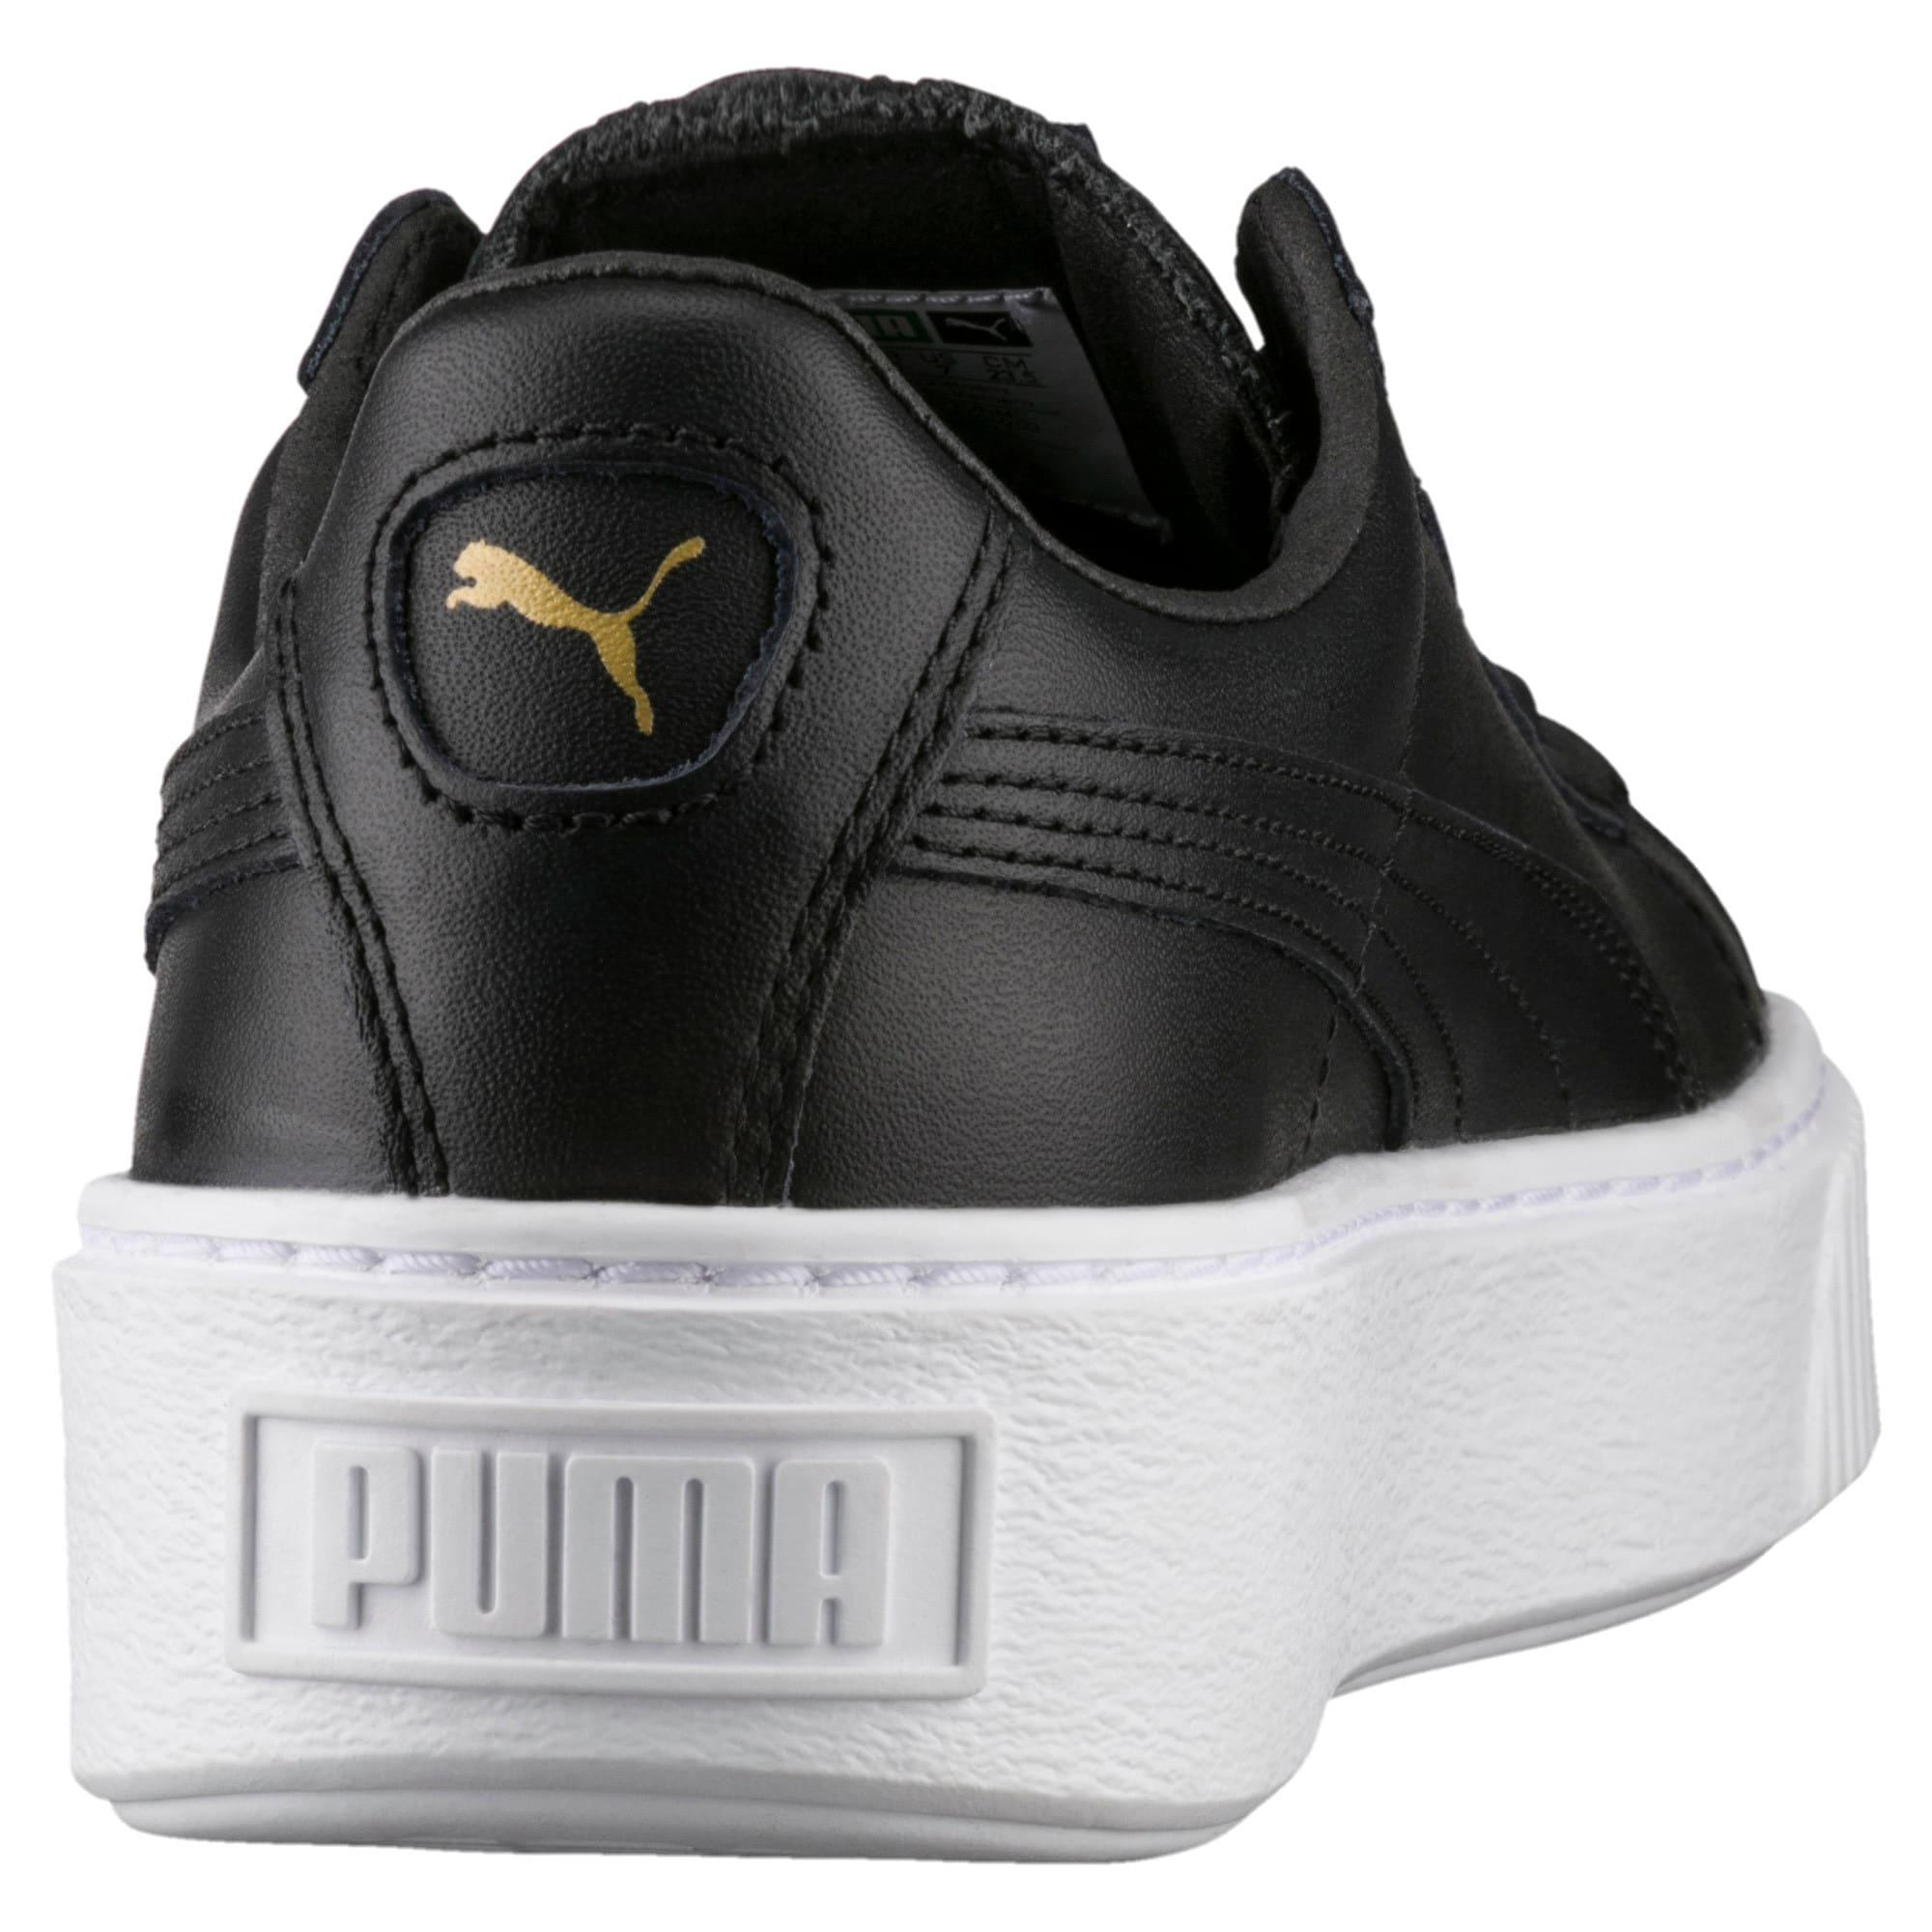 sports shoes 659fe e019b Basket Platform Core Women's Trainers